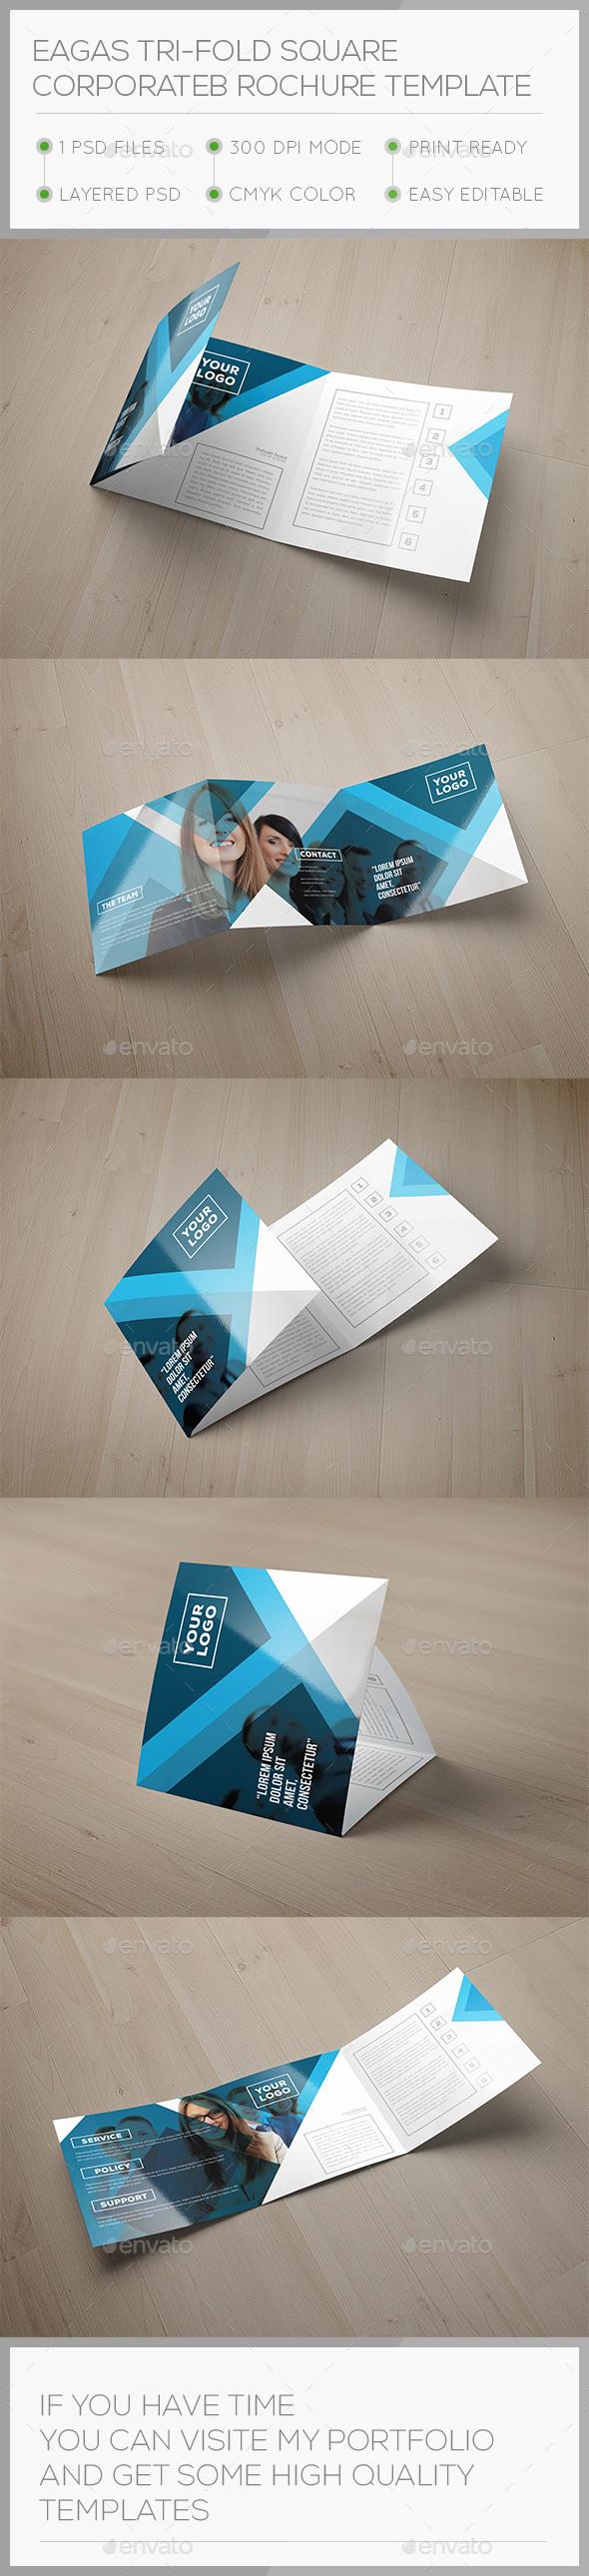 Eagas Tri-fold Square Brochure Template - Brochures Print Templates